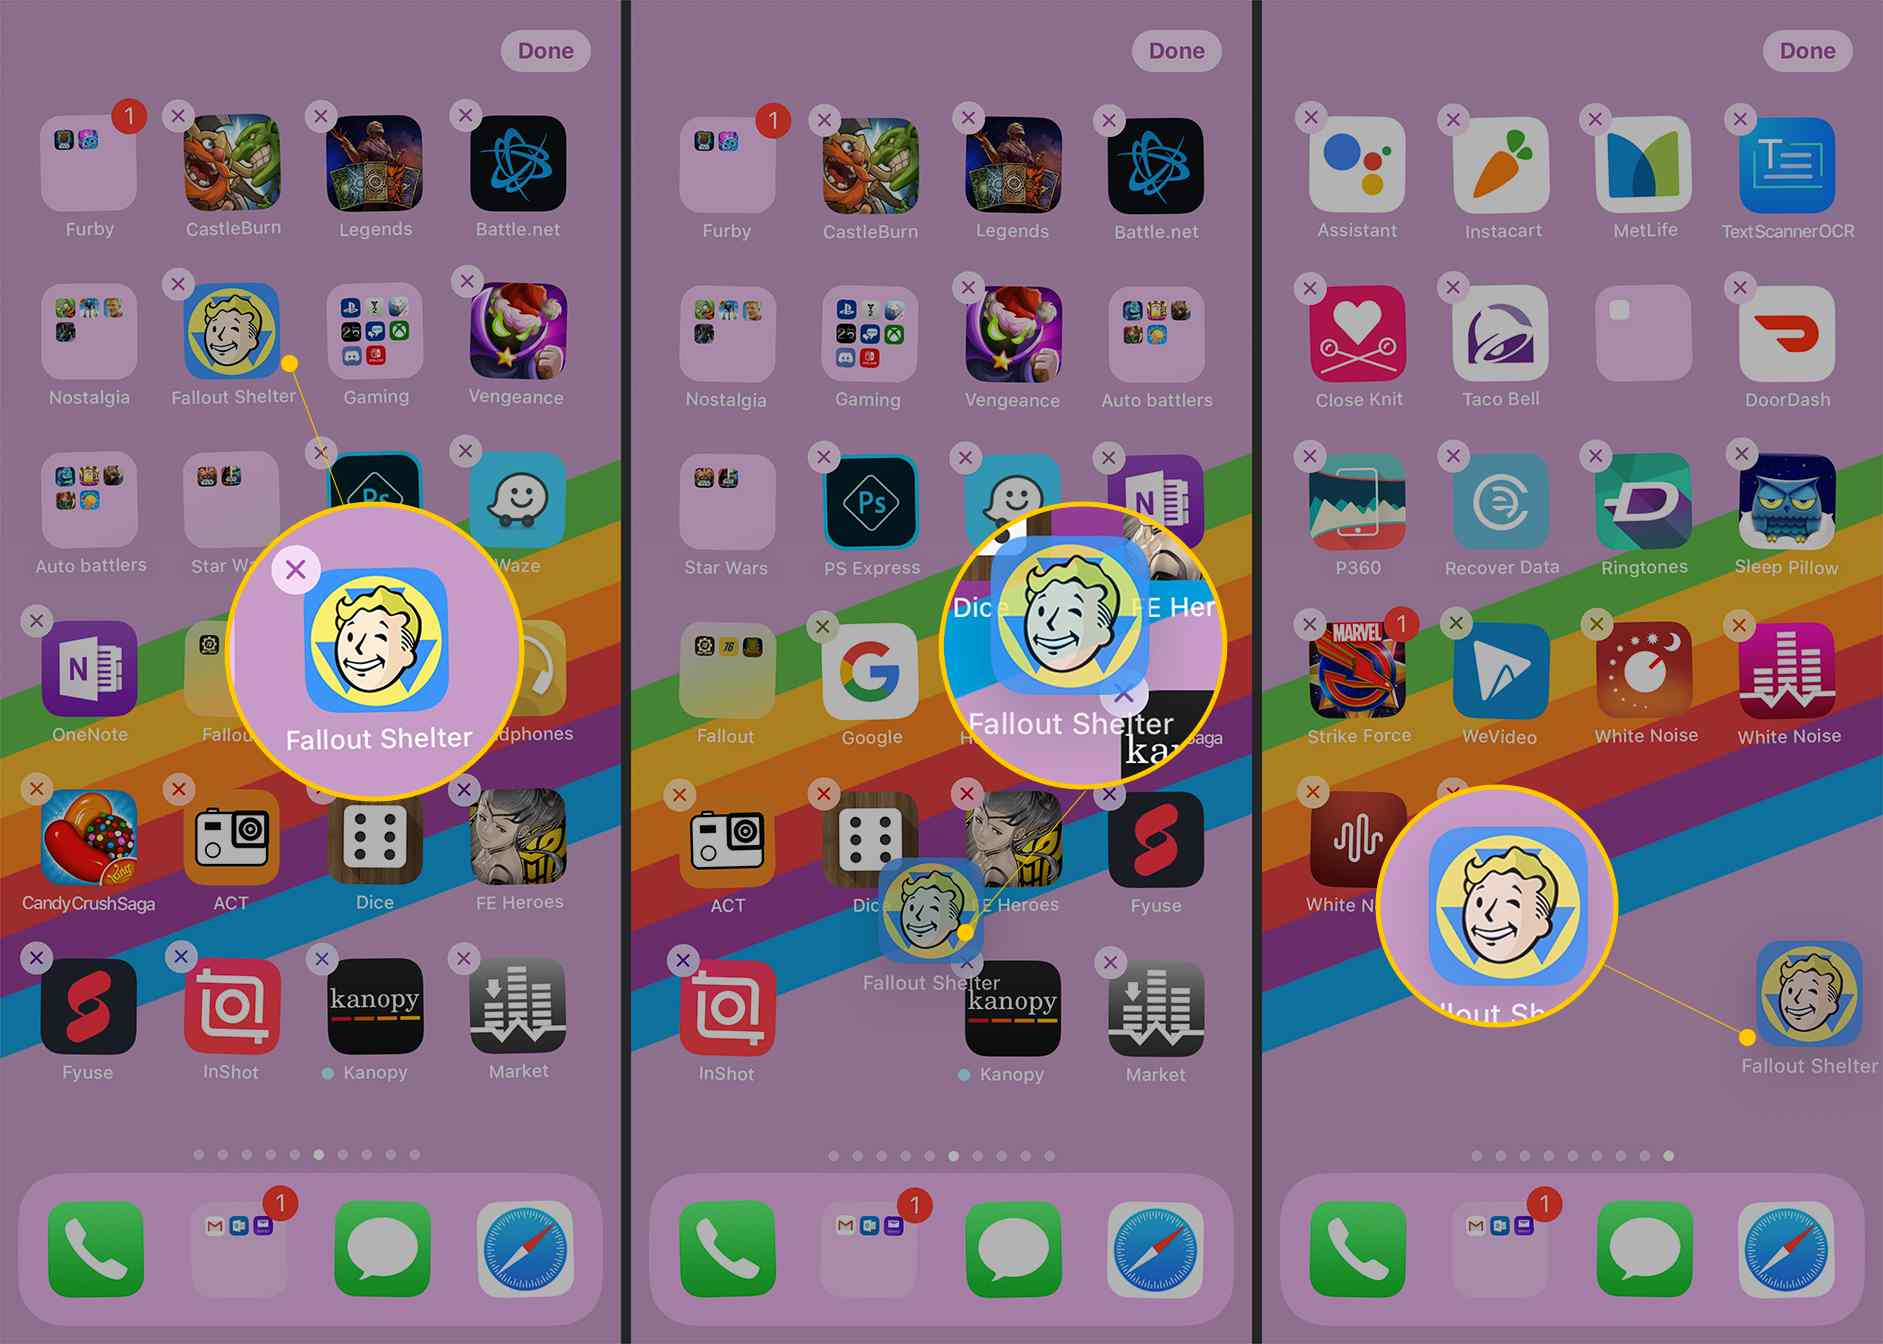 Organize Iphone Photos